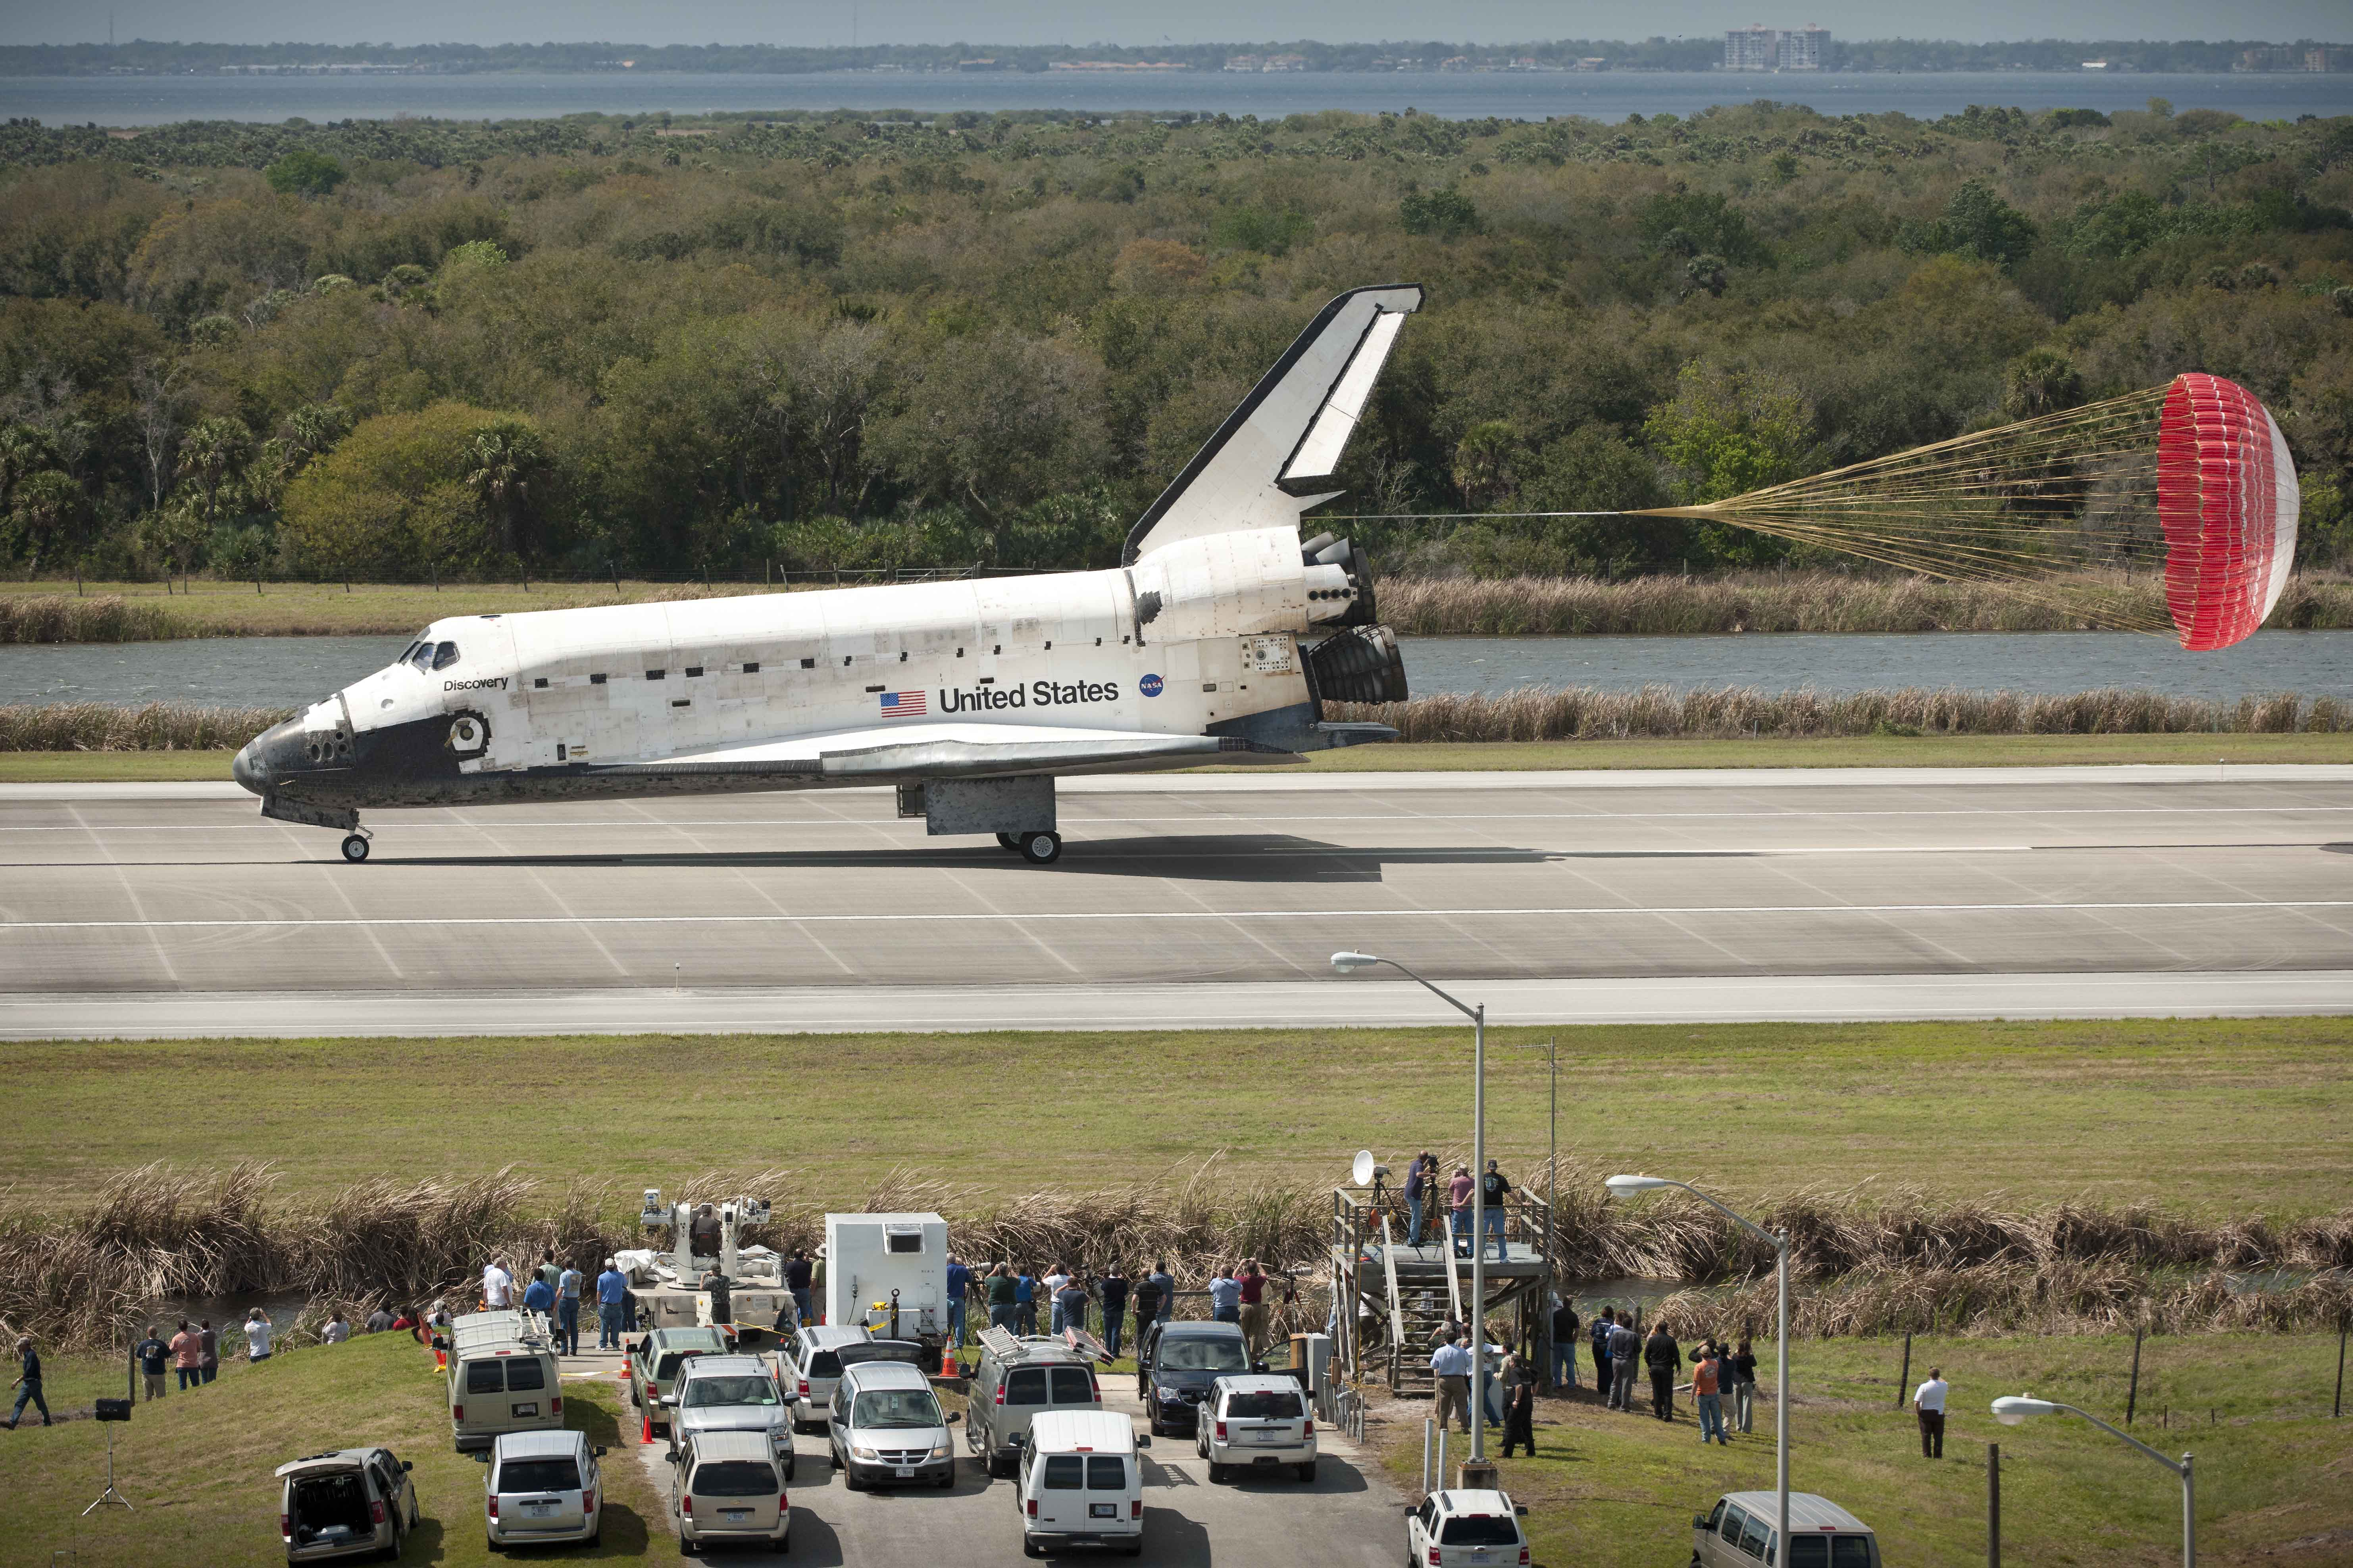 nasa landing today - photo #4